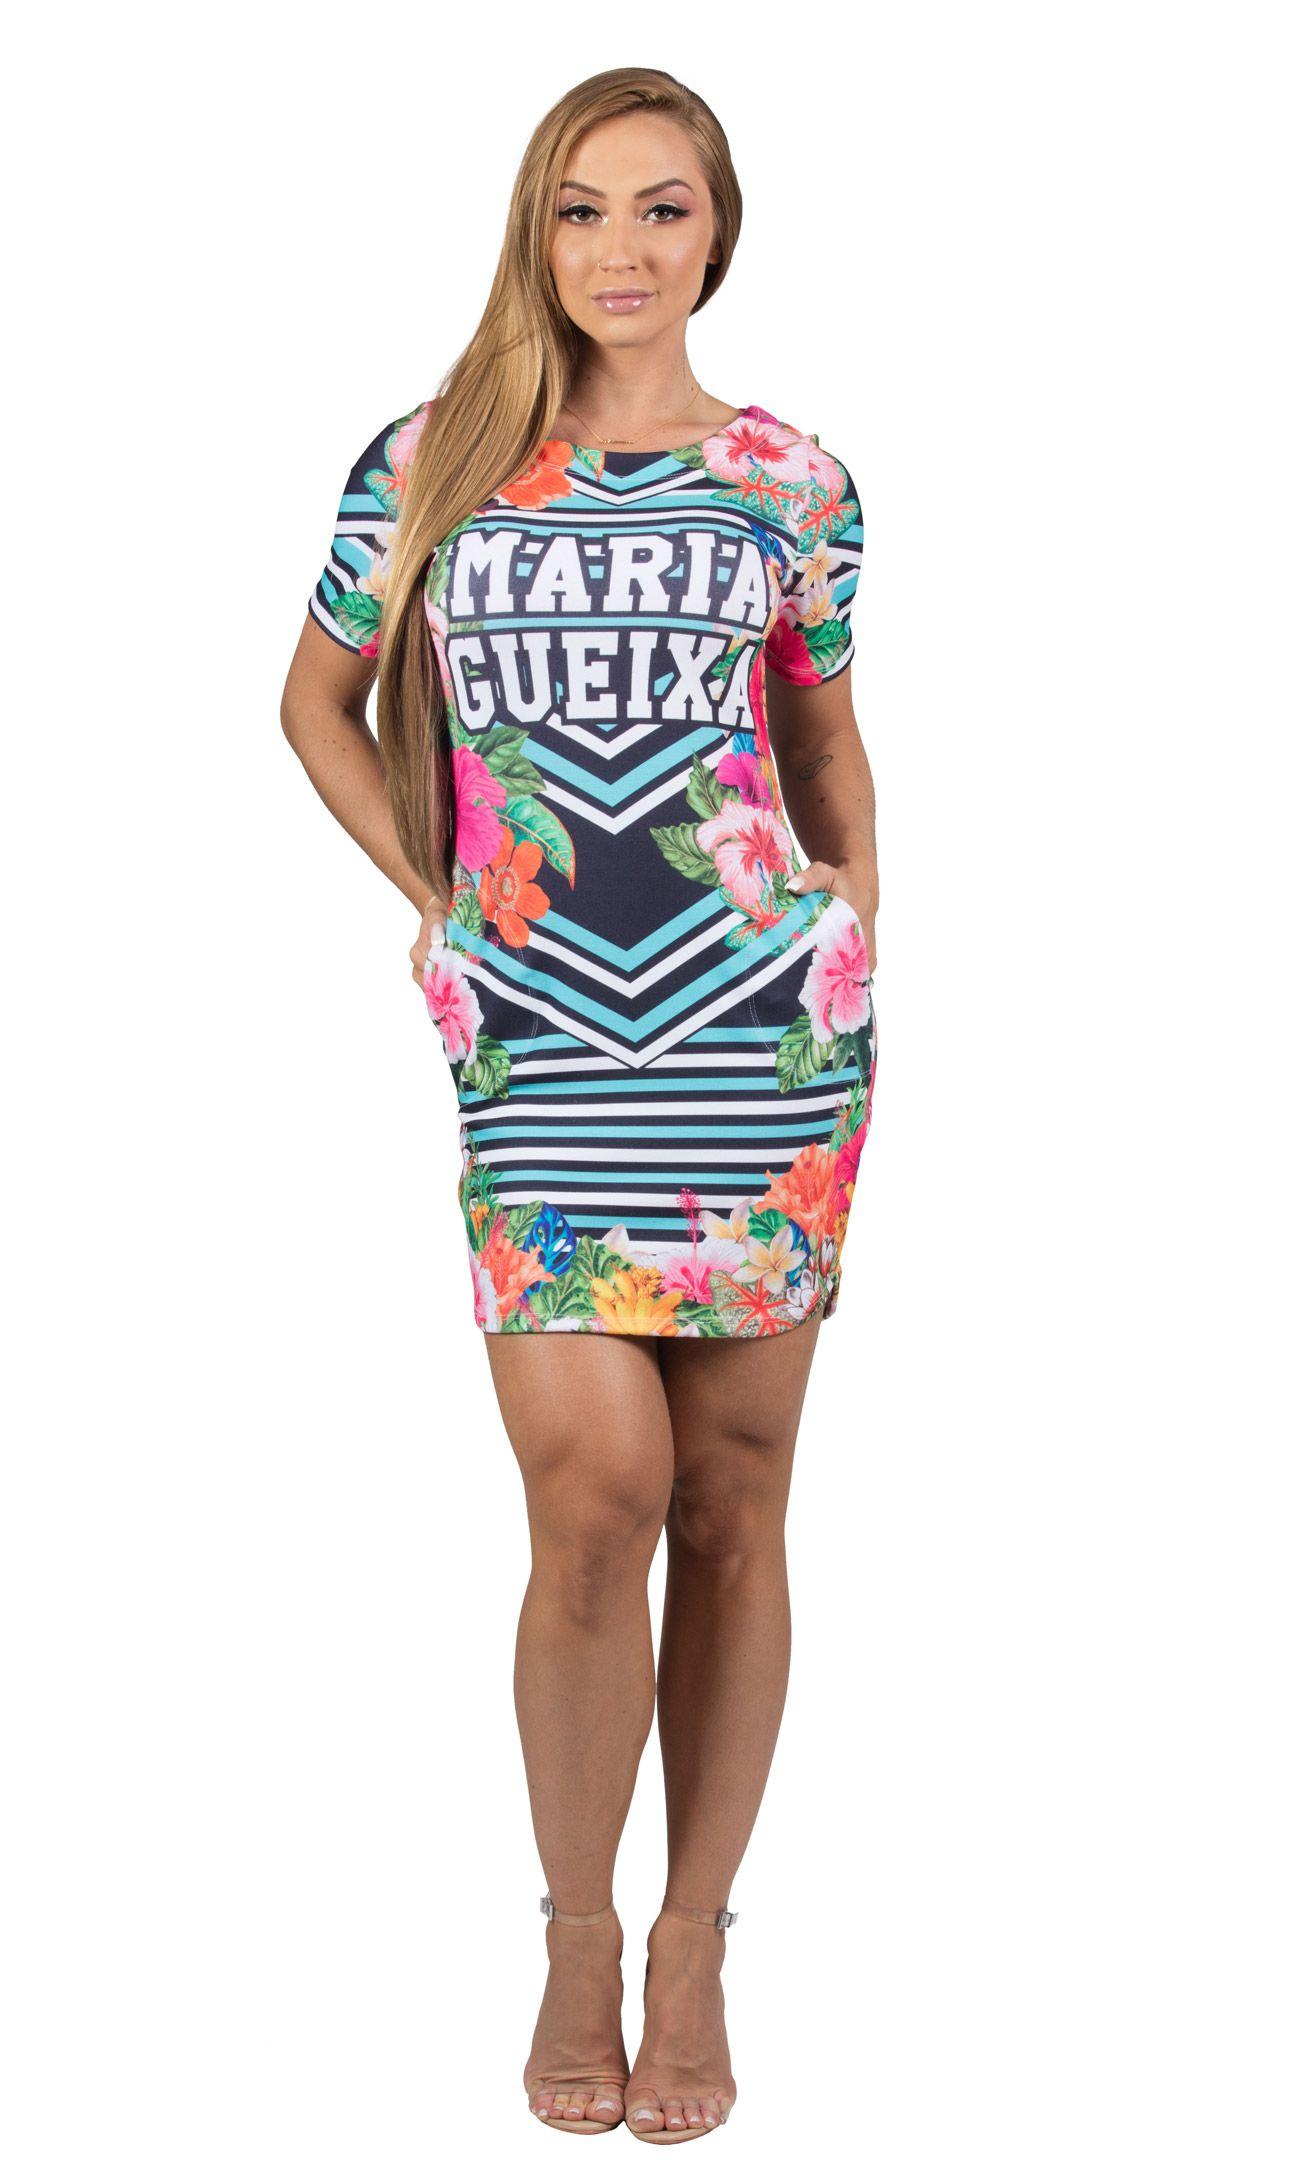 Vestido Curto Comfort Tropical Maria Gueixa Floral